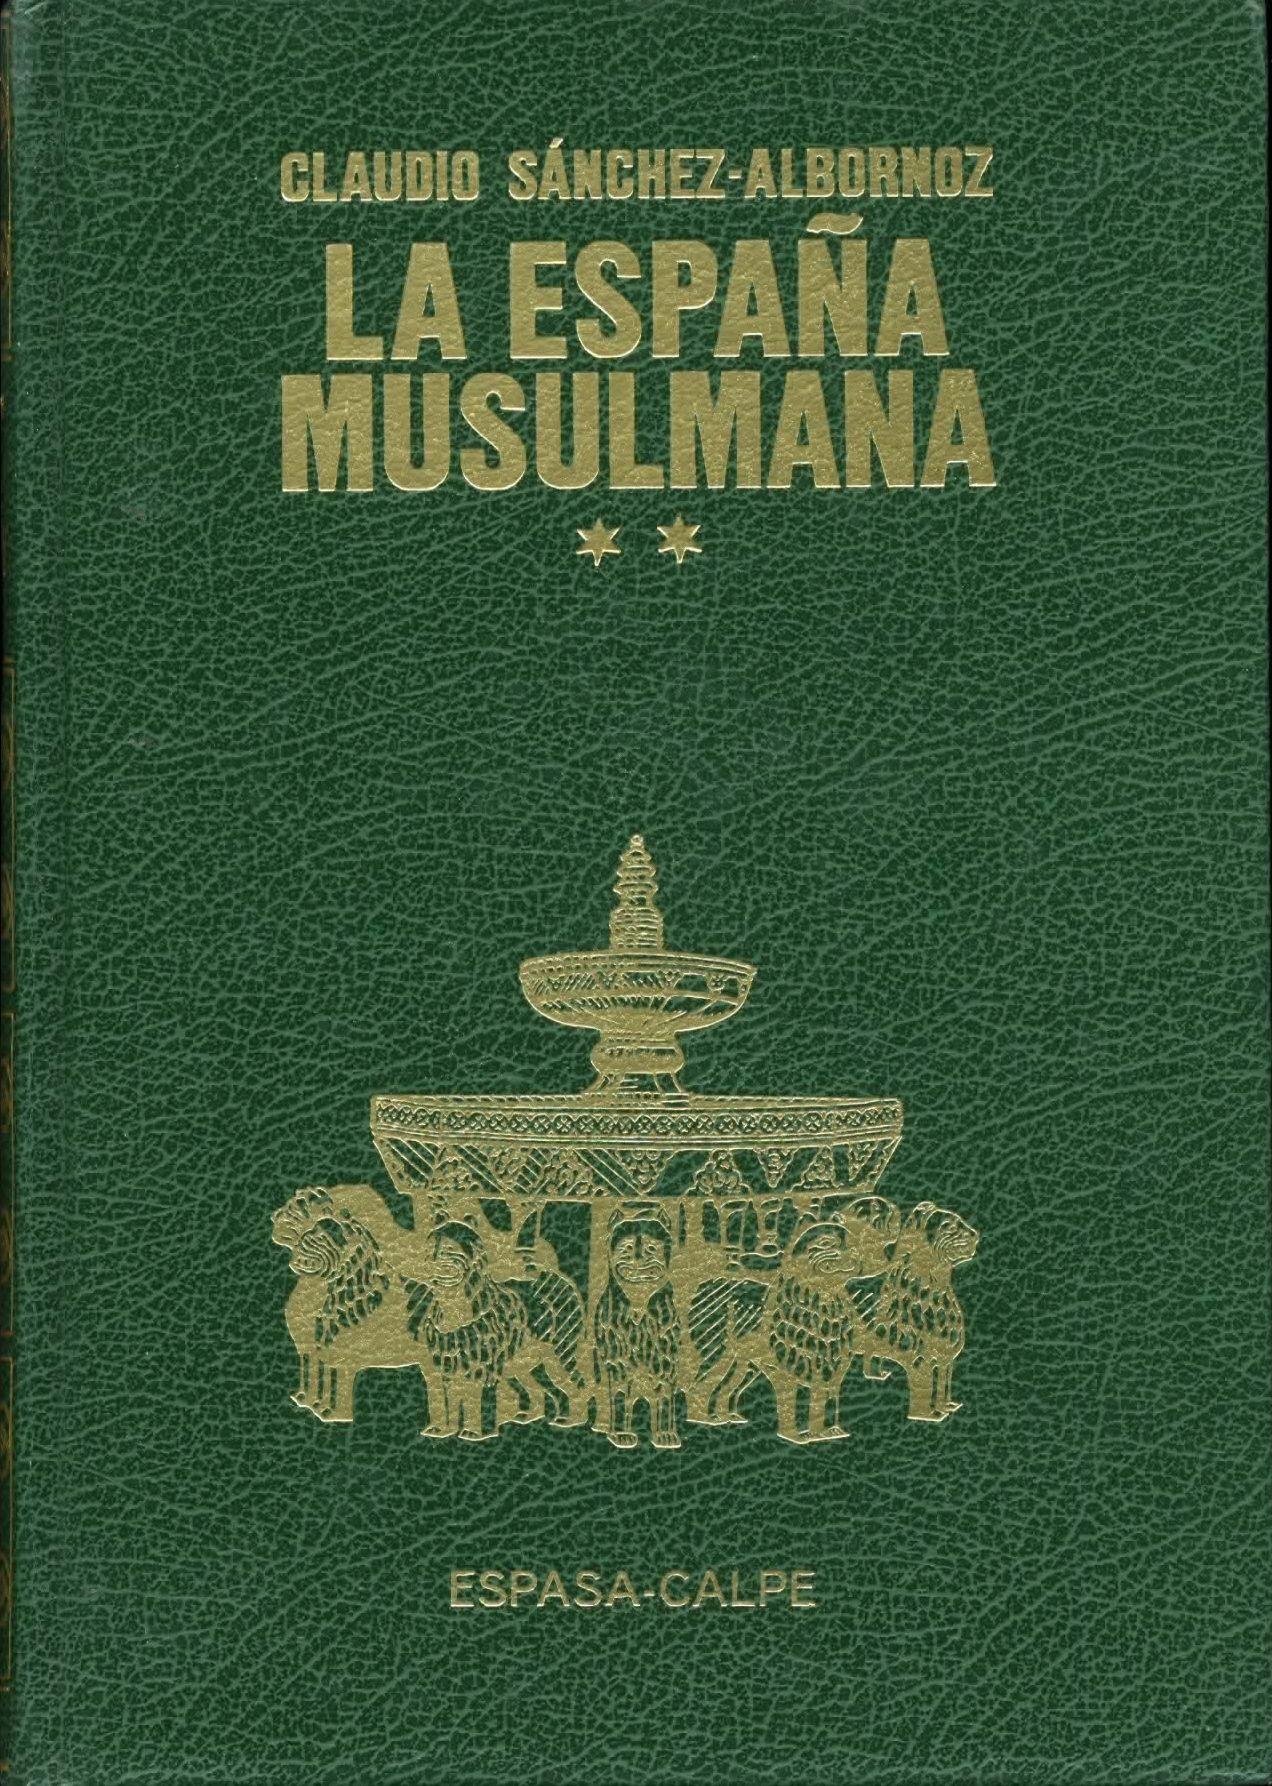 Claudio Sáchez-Albornoz. La España Musulmana (II). Espasa. #BCarmelindaHistoria